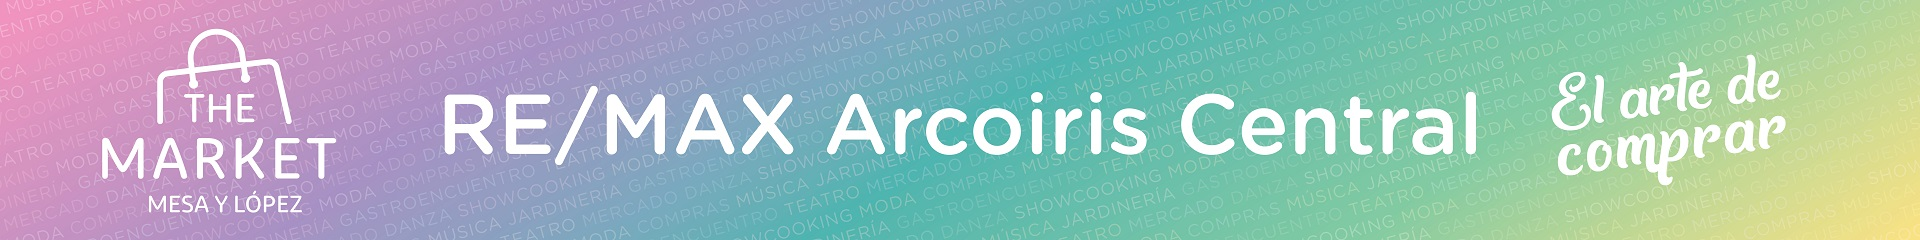 theMarket_cartelas_03_ReMAX Arcoiris Central